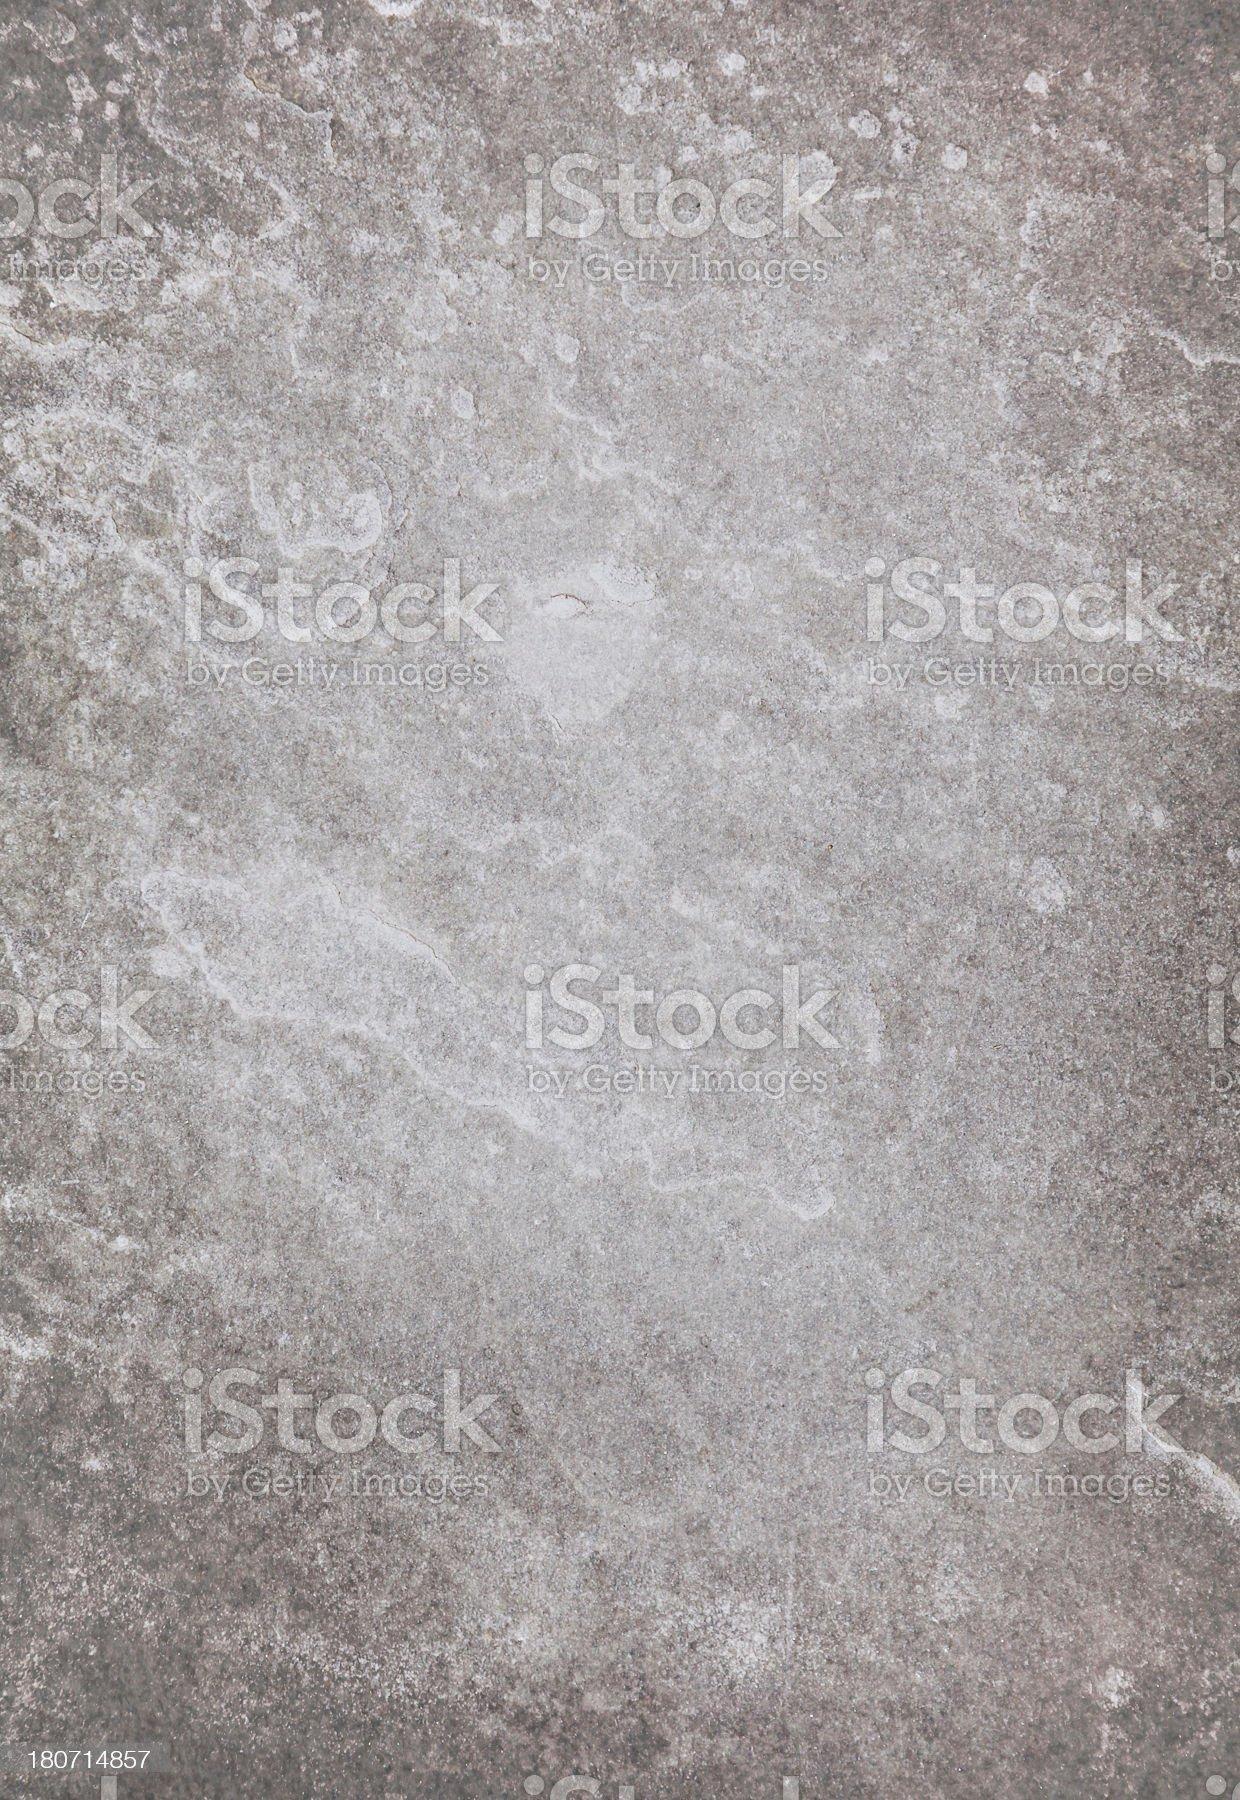 Grunge Background Texture royalty-free stock photo